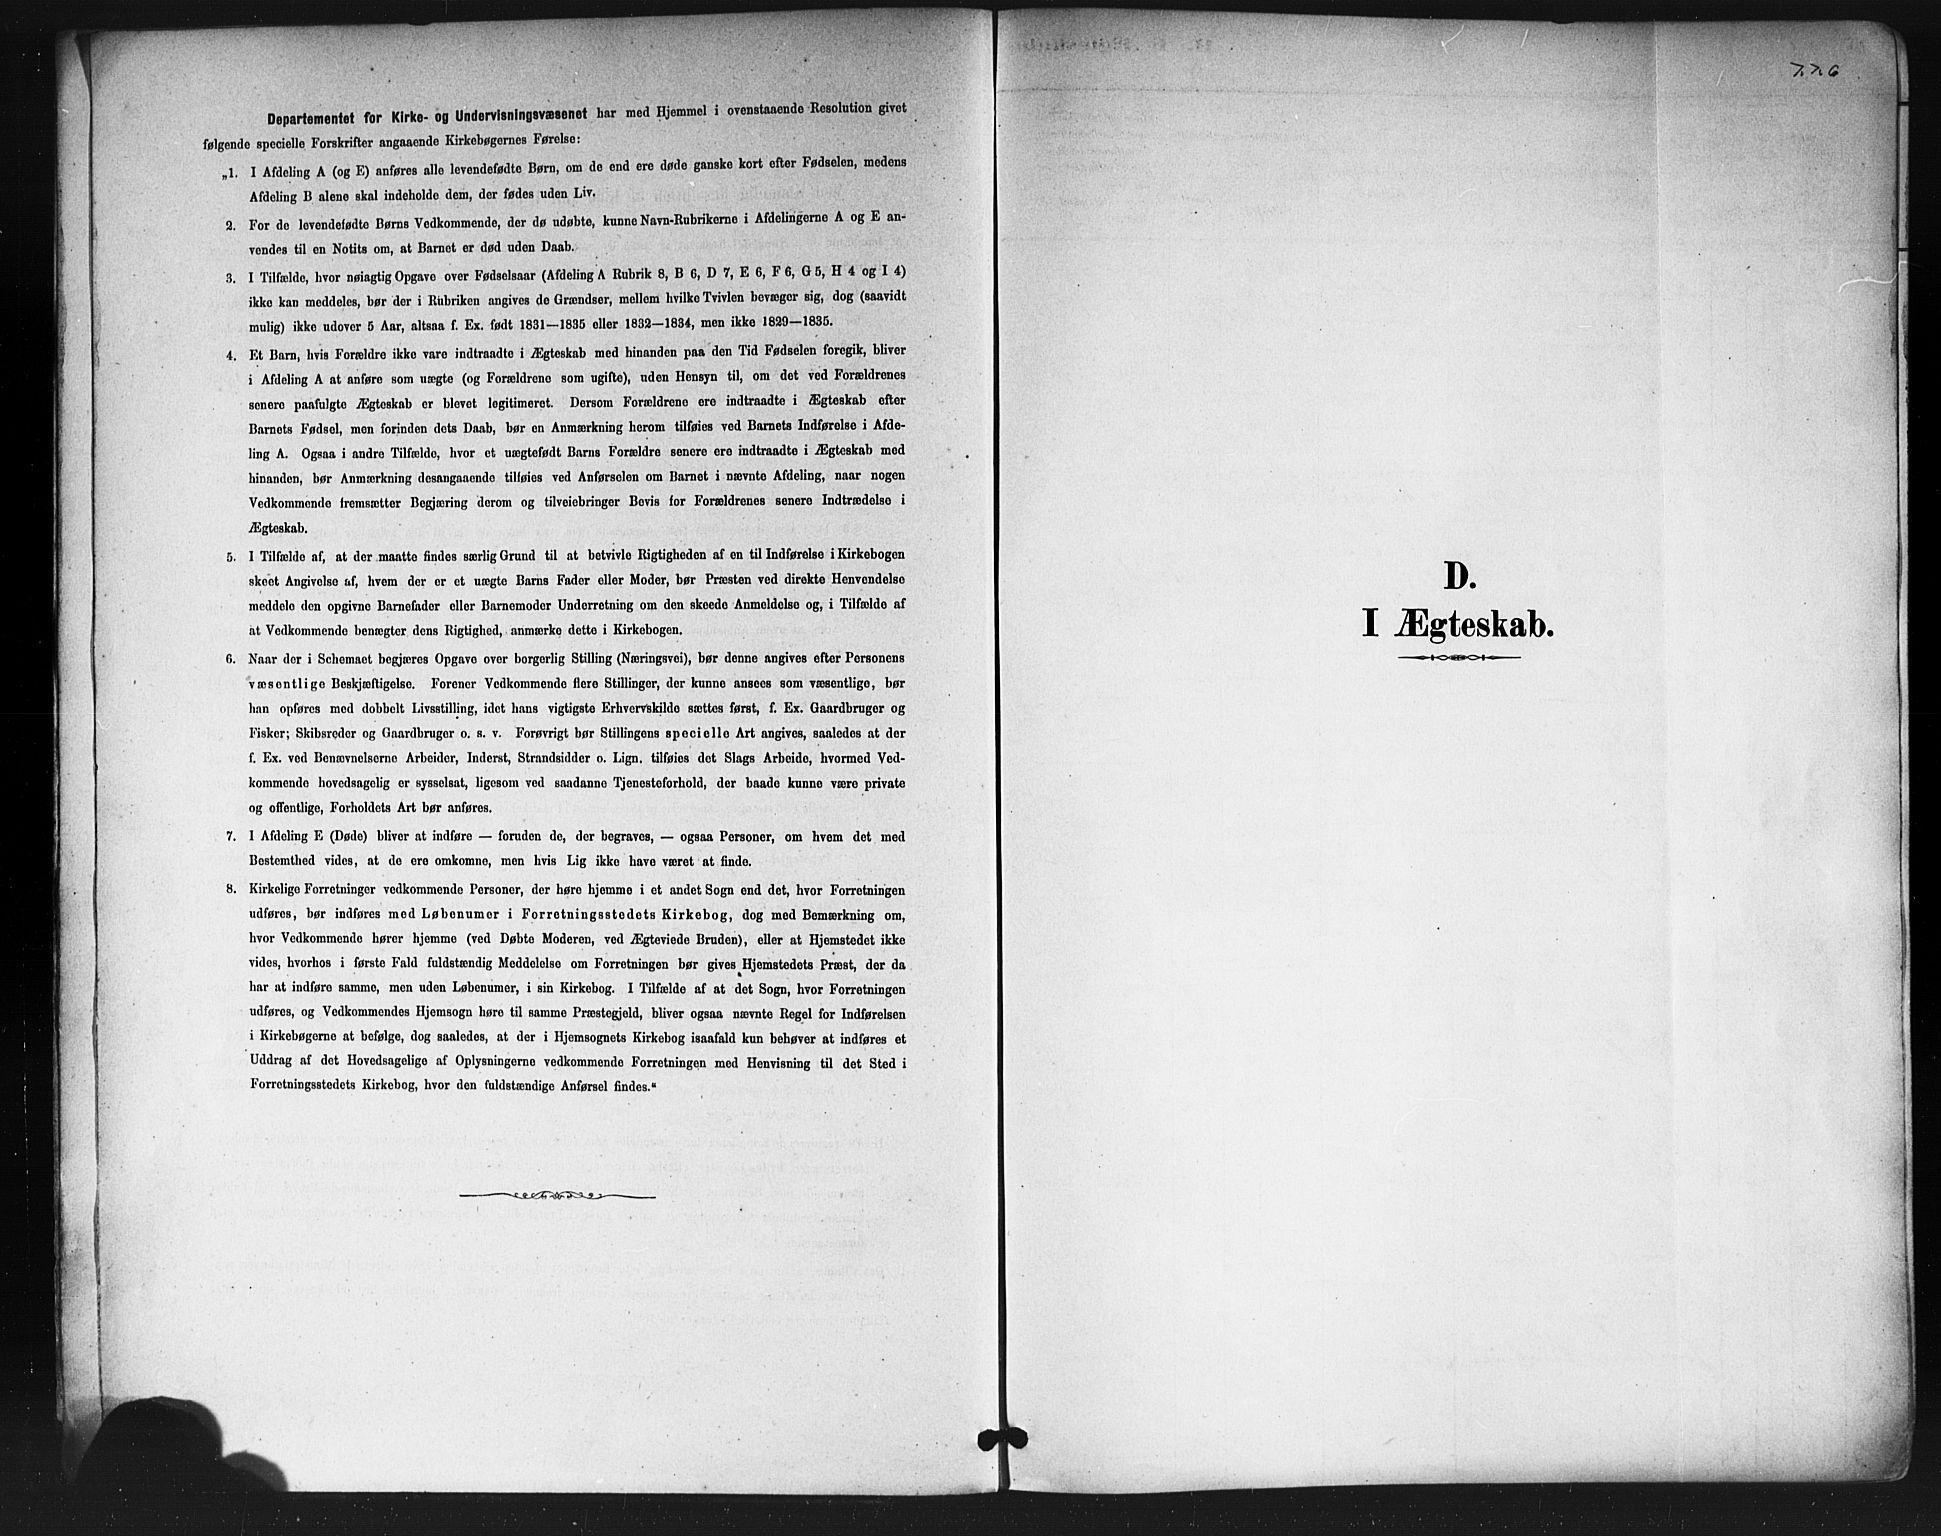 SAO, Oslo domkirke Kirkebøker, F/Fa/L0032: Ministerialbok nr. 32, 1885-1902